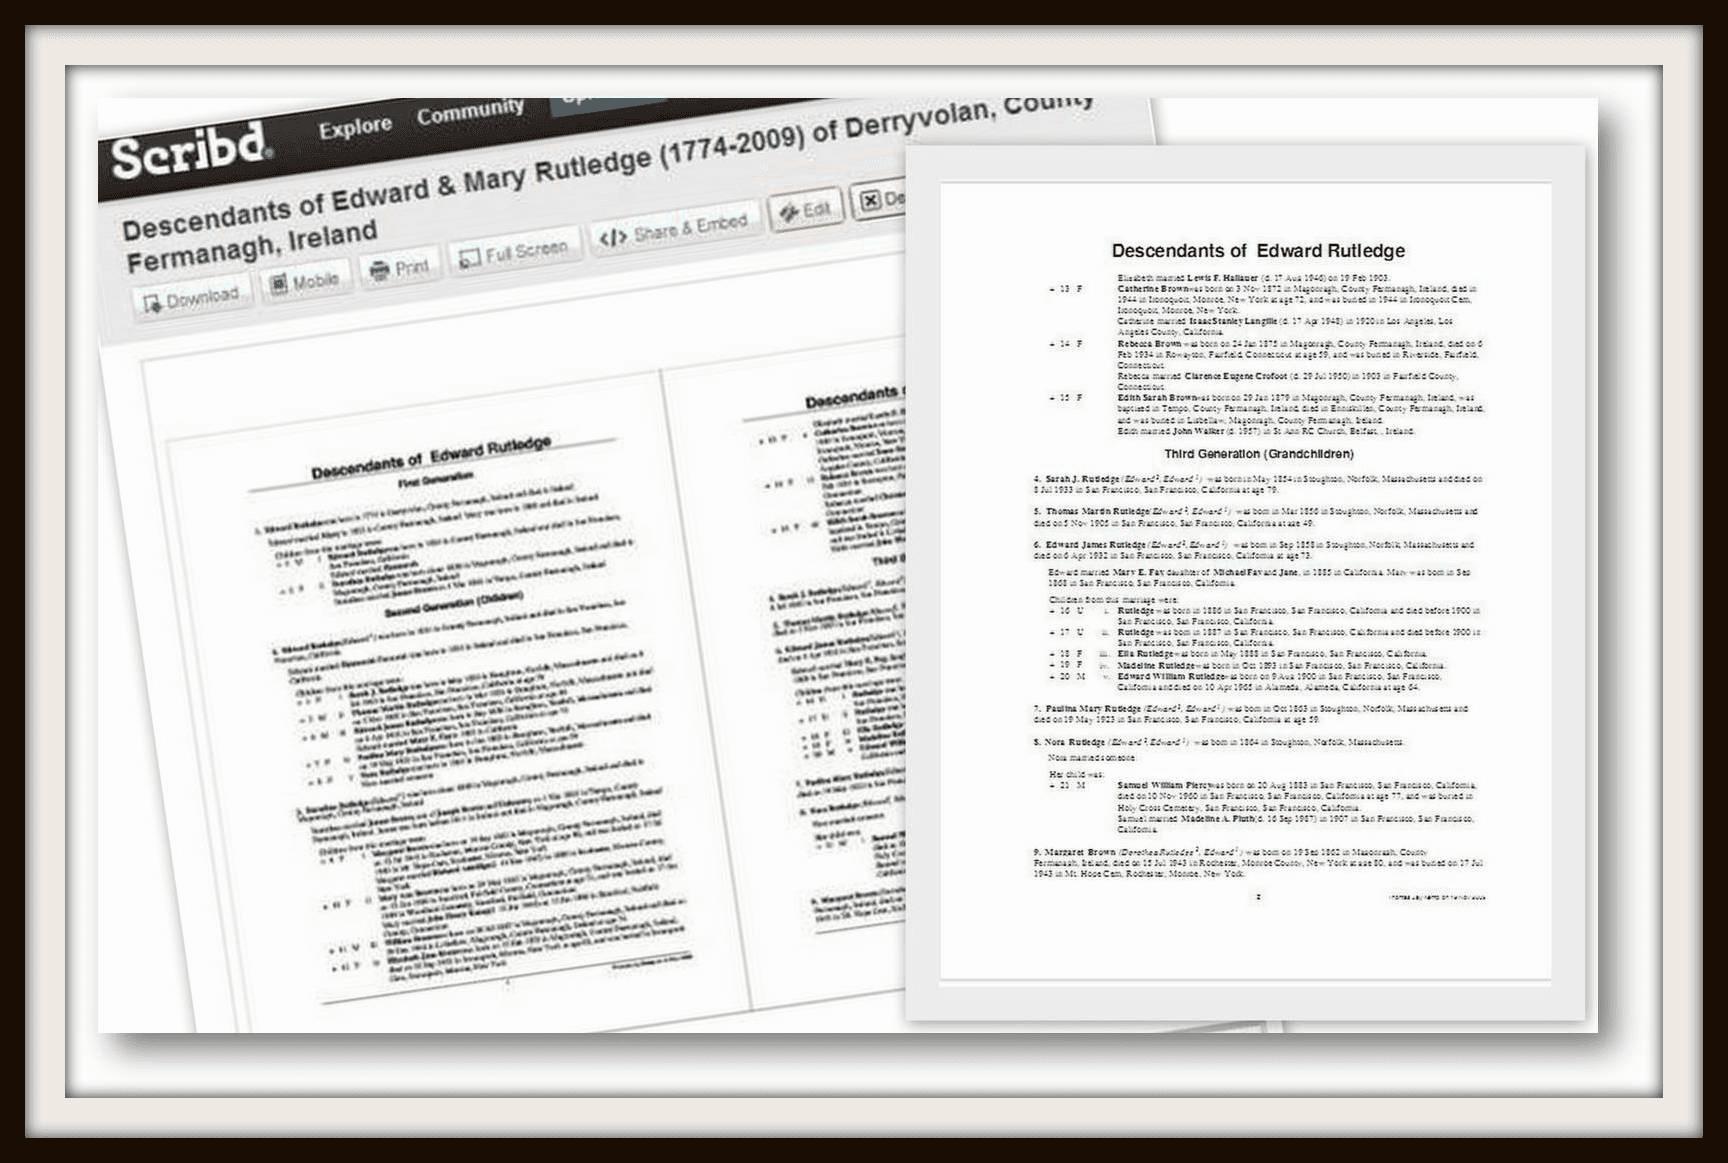 edward and mary rutledge genealogy records on Scribd.com